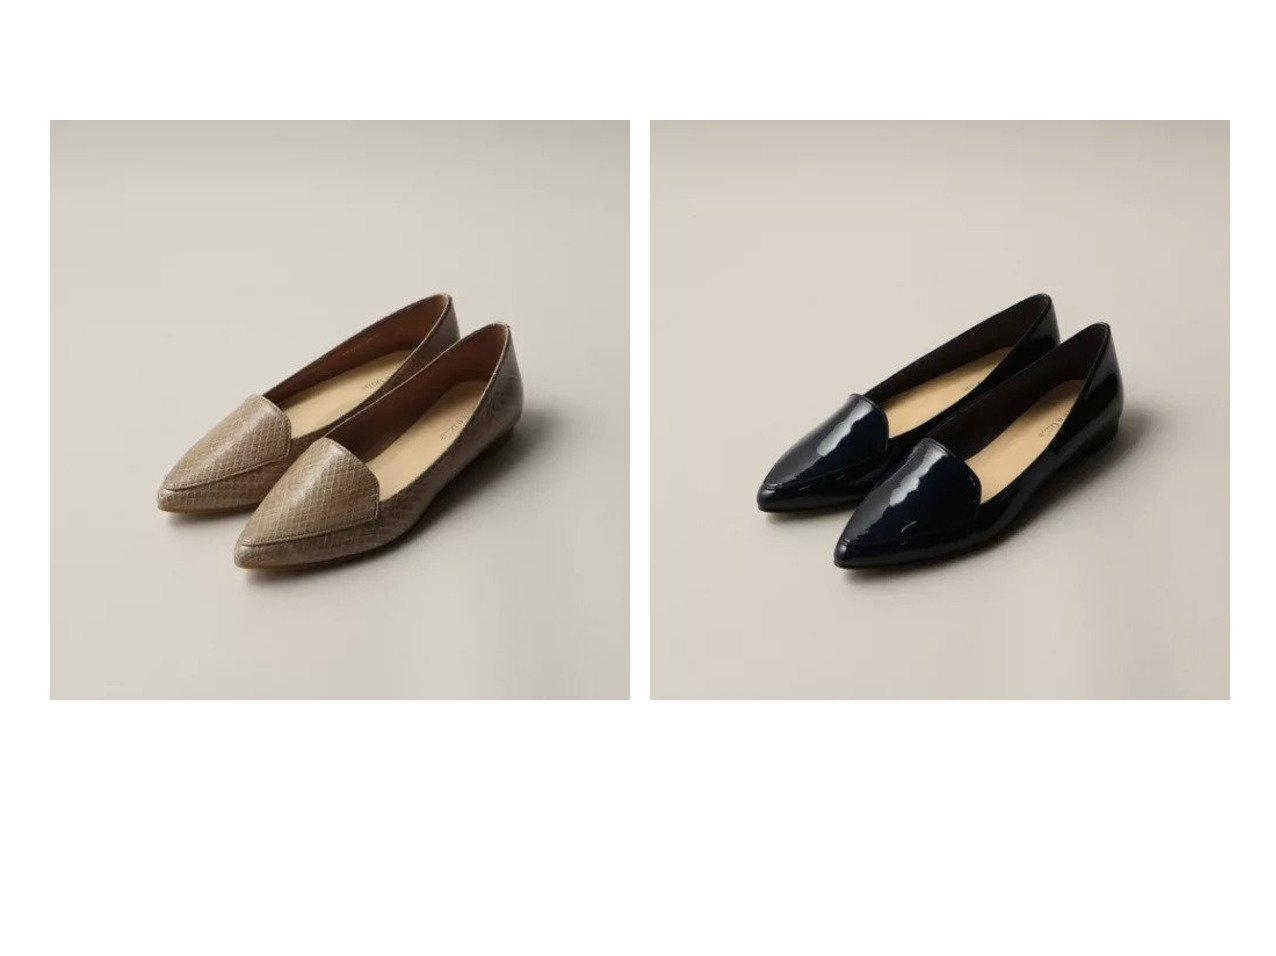 【Odette e Odile/オデット エ オディール】のR ポインテッドモカ フラット15◎↓↑ 【シューズ・靴】おすすめ!人気、トレンド・レディースファッションの通販  おすすめで人気の流行・トレンド、ファッションの通販商品 インテリア・家具・メンズファッション・キッズファッション・レディースファッション・服の通販 founy(ファニー) https://founy.com/ ファッション Fashion レディースファッション WOMEN 抗菌 シューズ 人気 フラット |ID:crp329100000062299